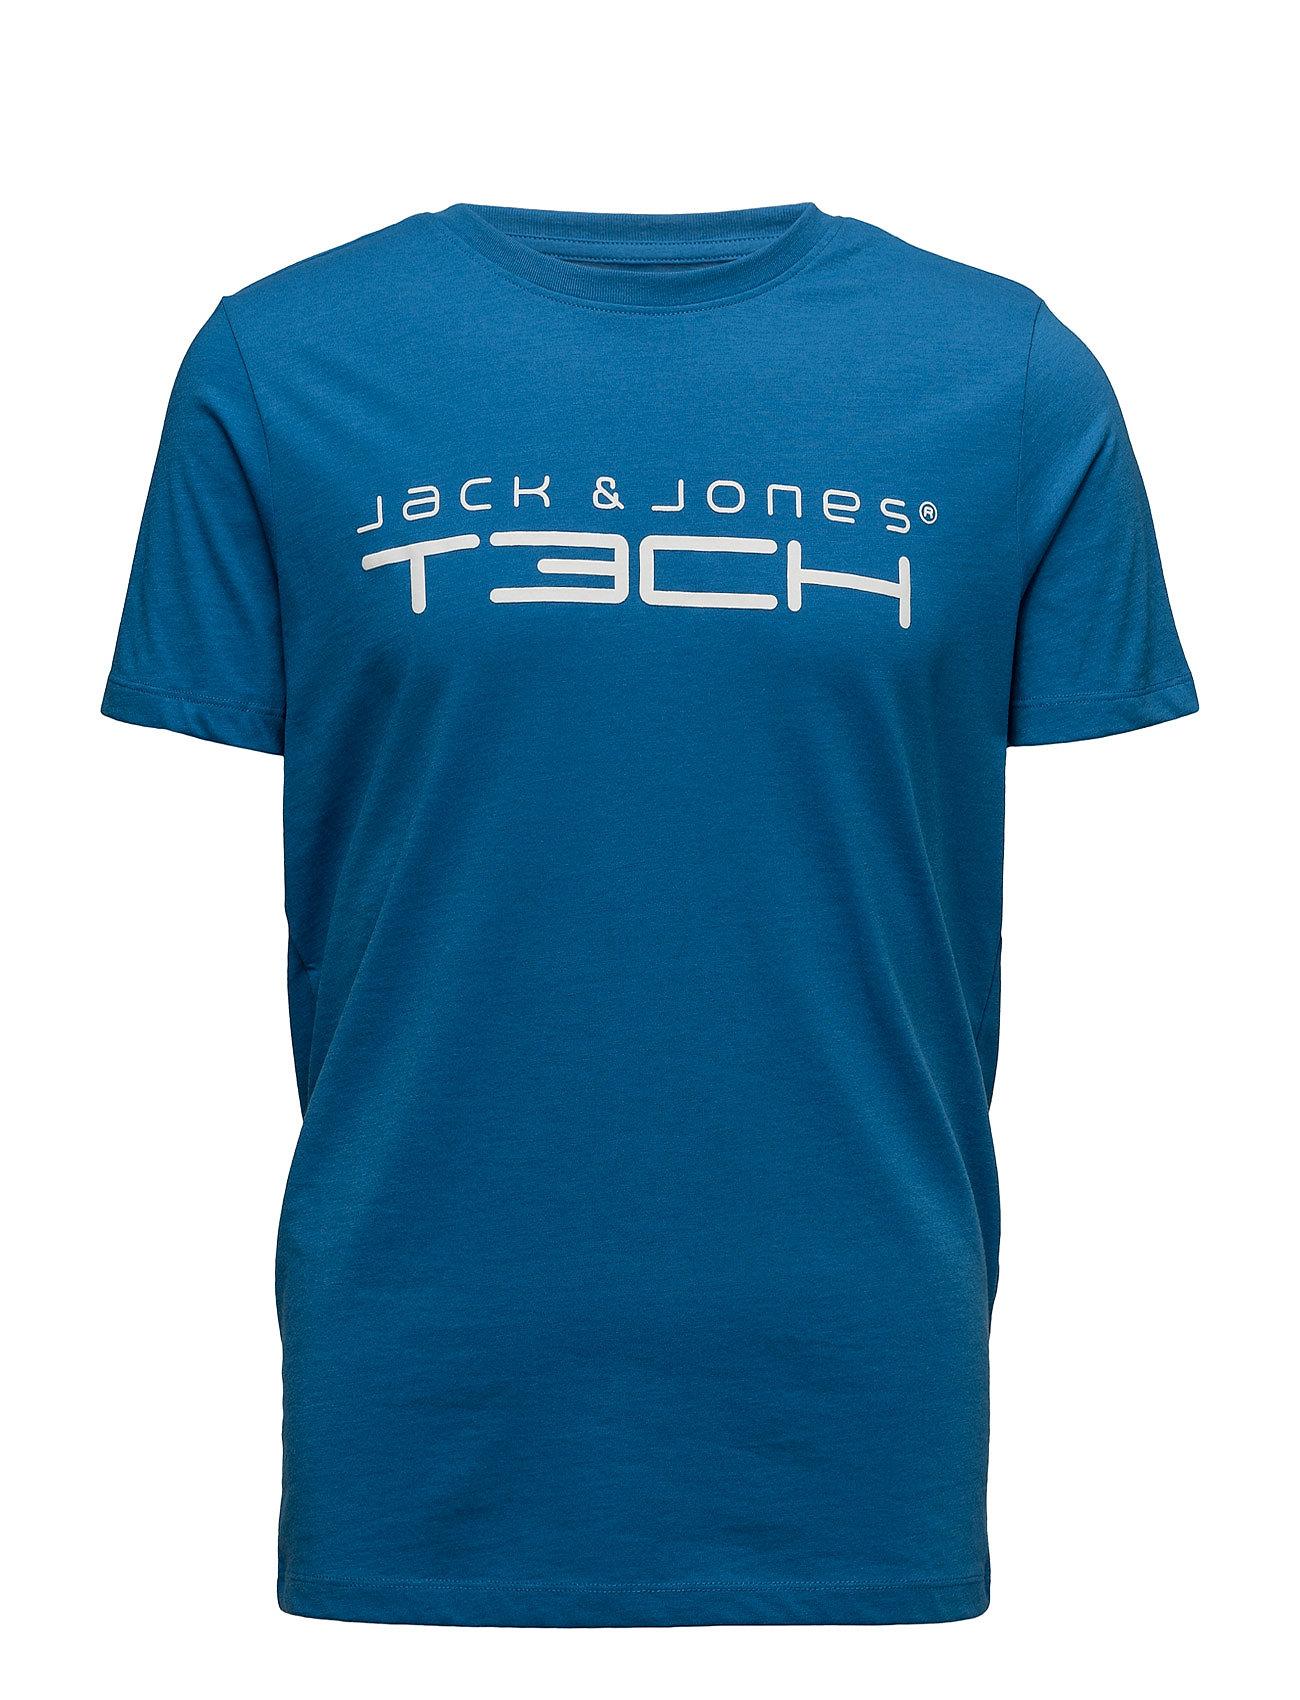 Jjtcfoamnew Tee Ss Crew Neck Noos Jack & Jones Tech  til Herrer i Light Grey Melange